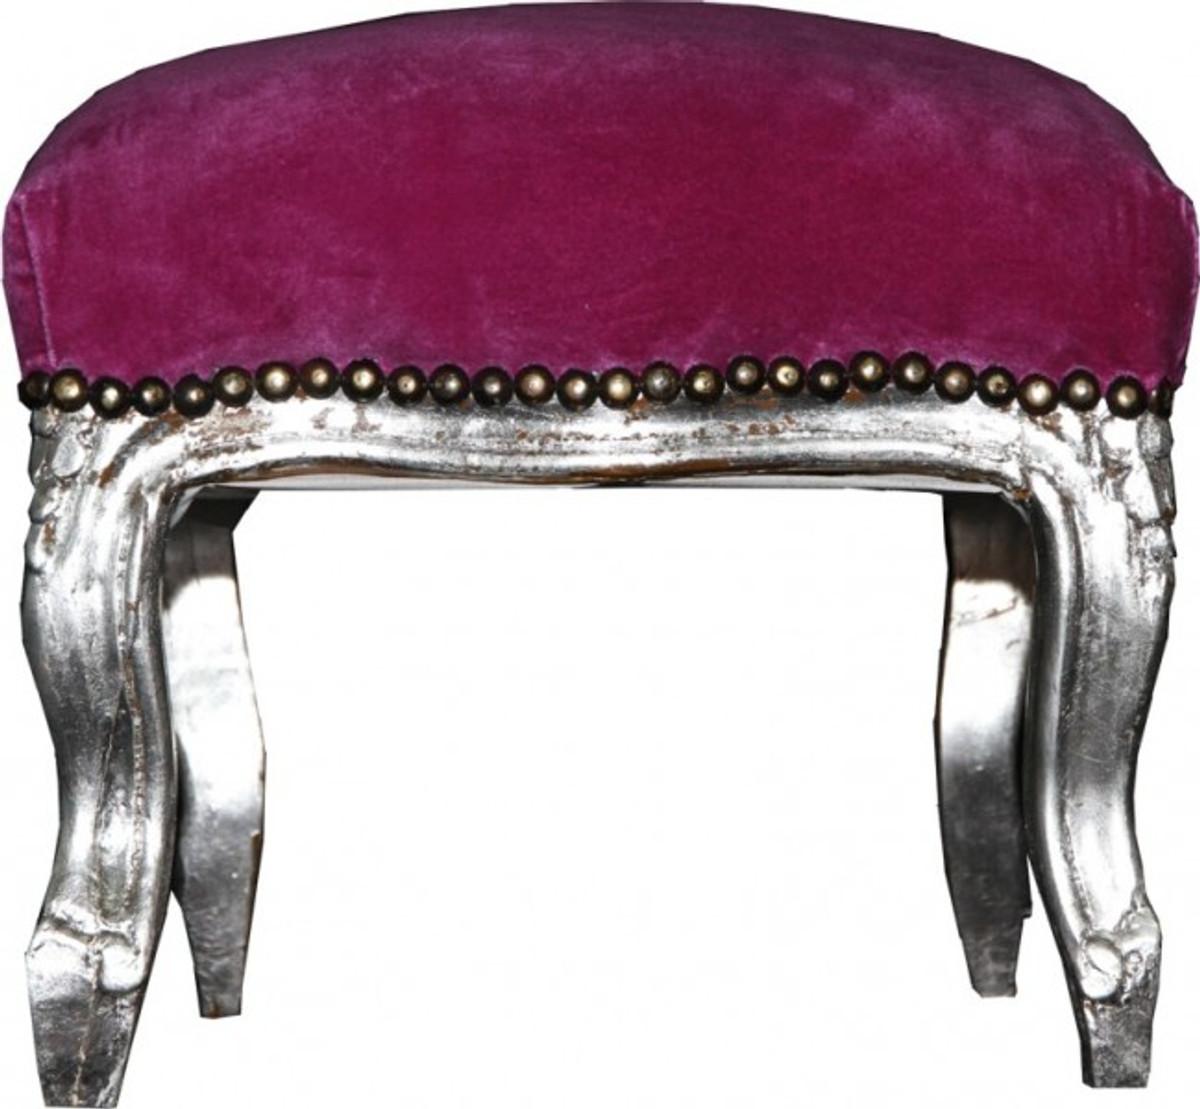 baroque ottoman purple silver stools baroque stools. Black Bedroom Furniture Sets. Home Design Ideas